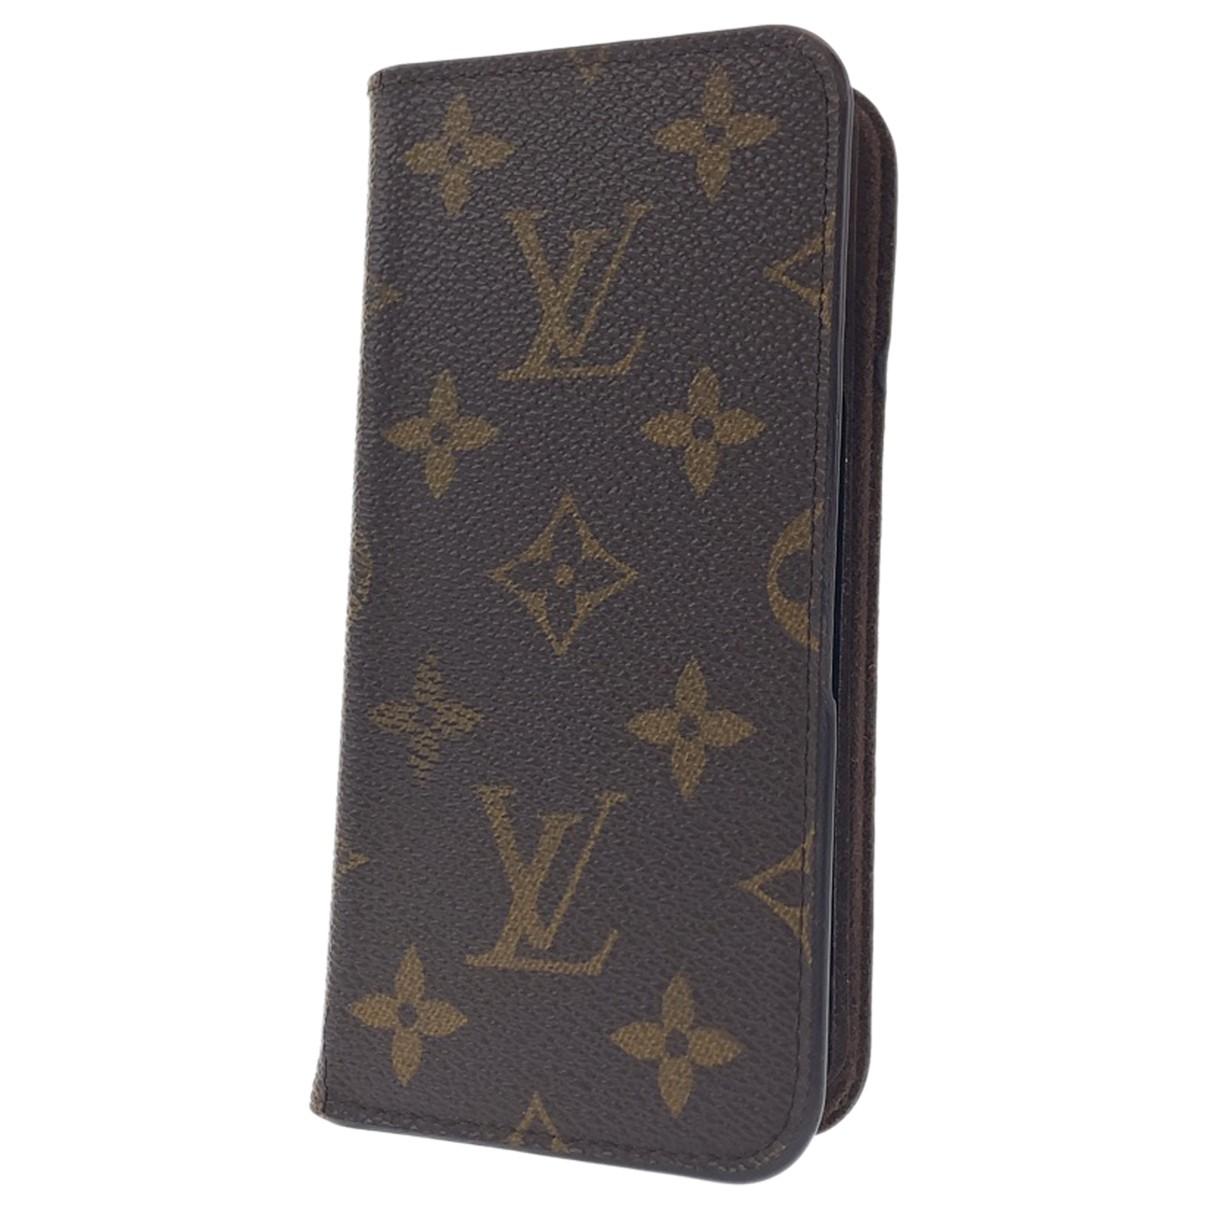 Louis Vuitton \N Kleinlederwaren in  Braun Synthetik